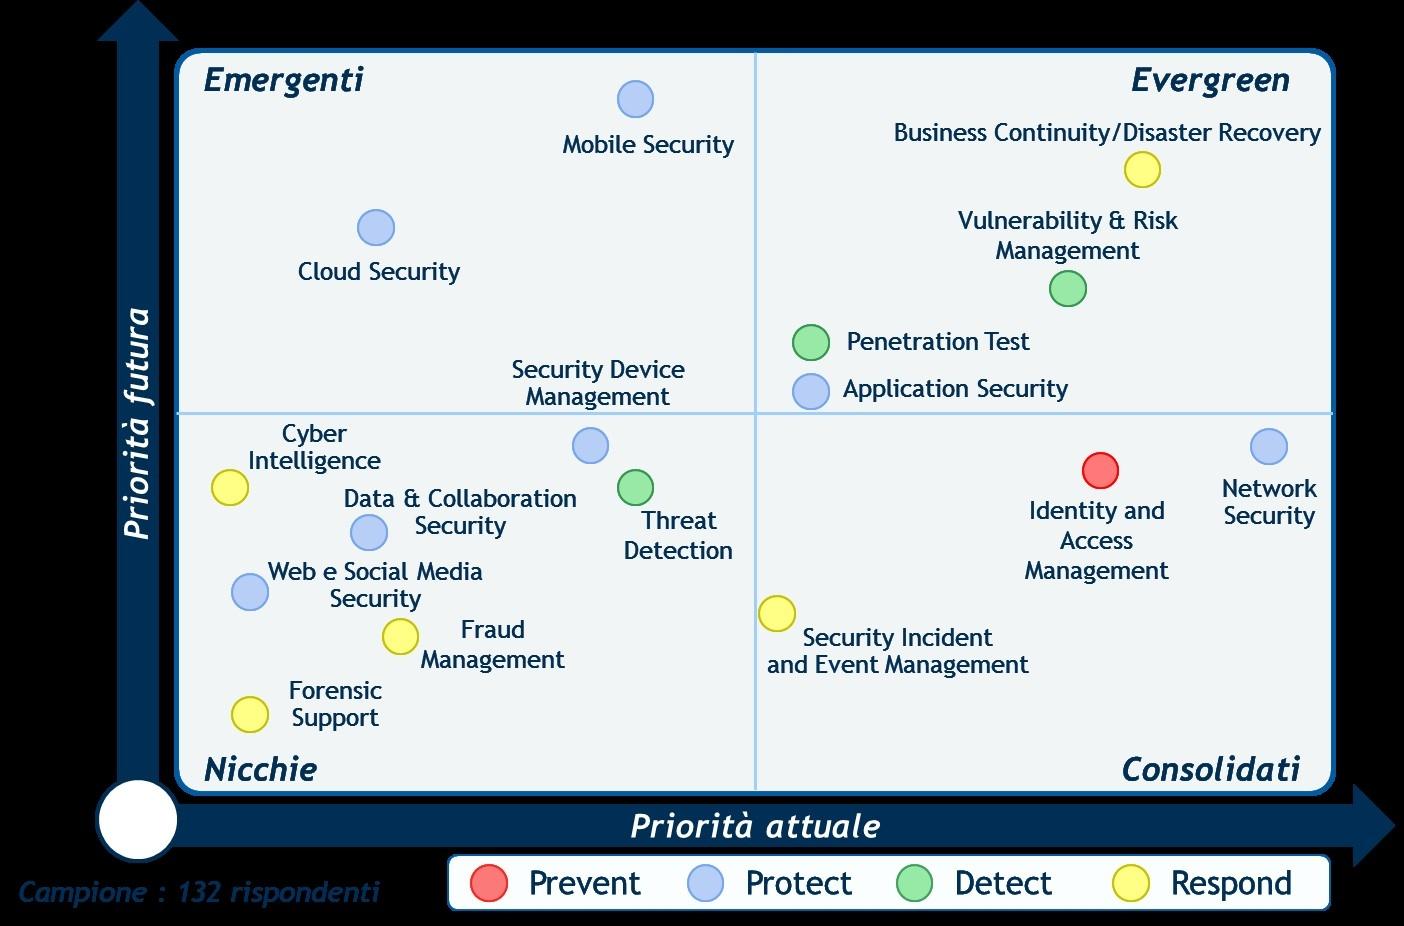 Le priorità di spesa in Information Security